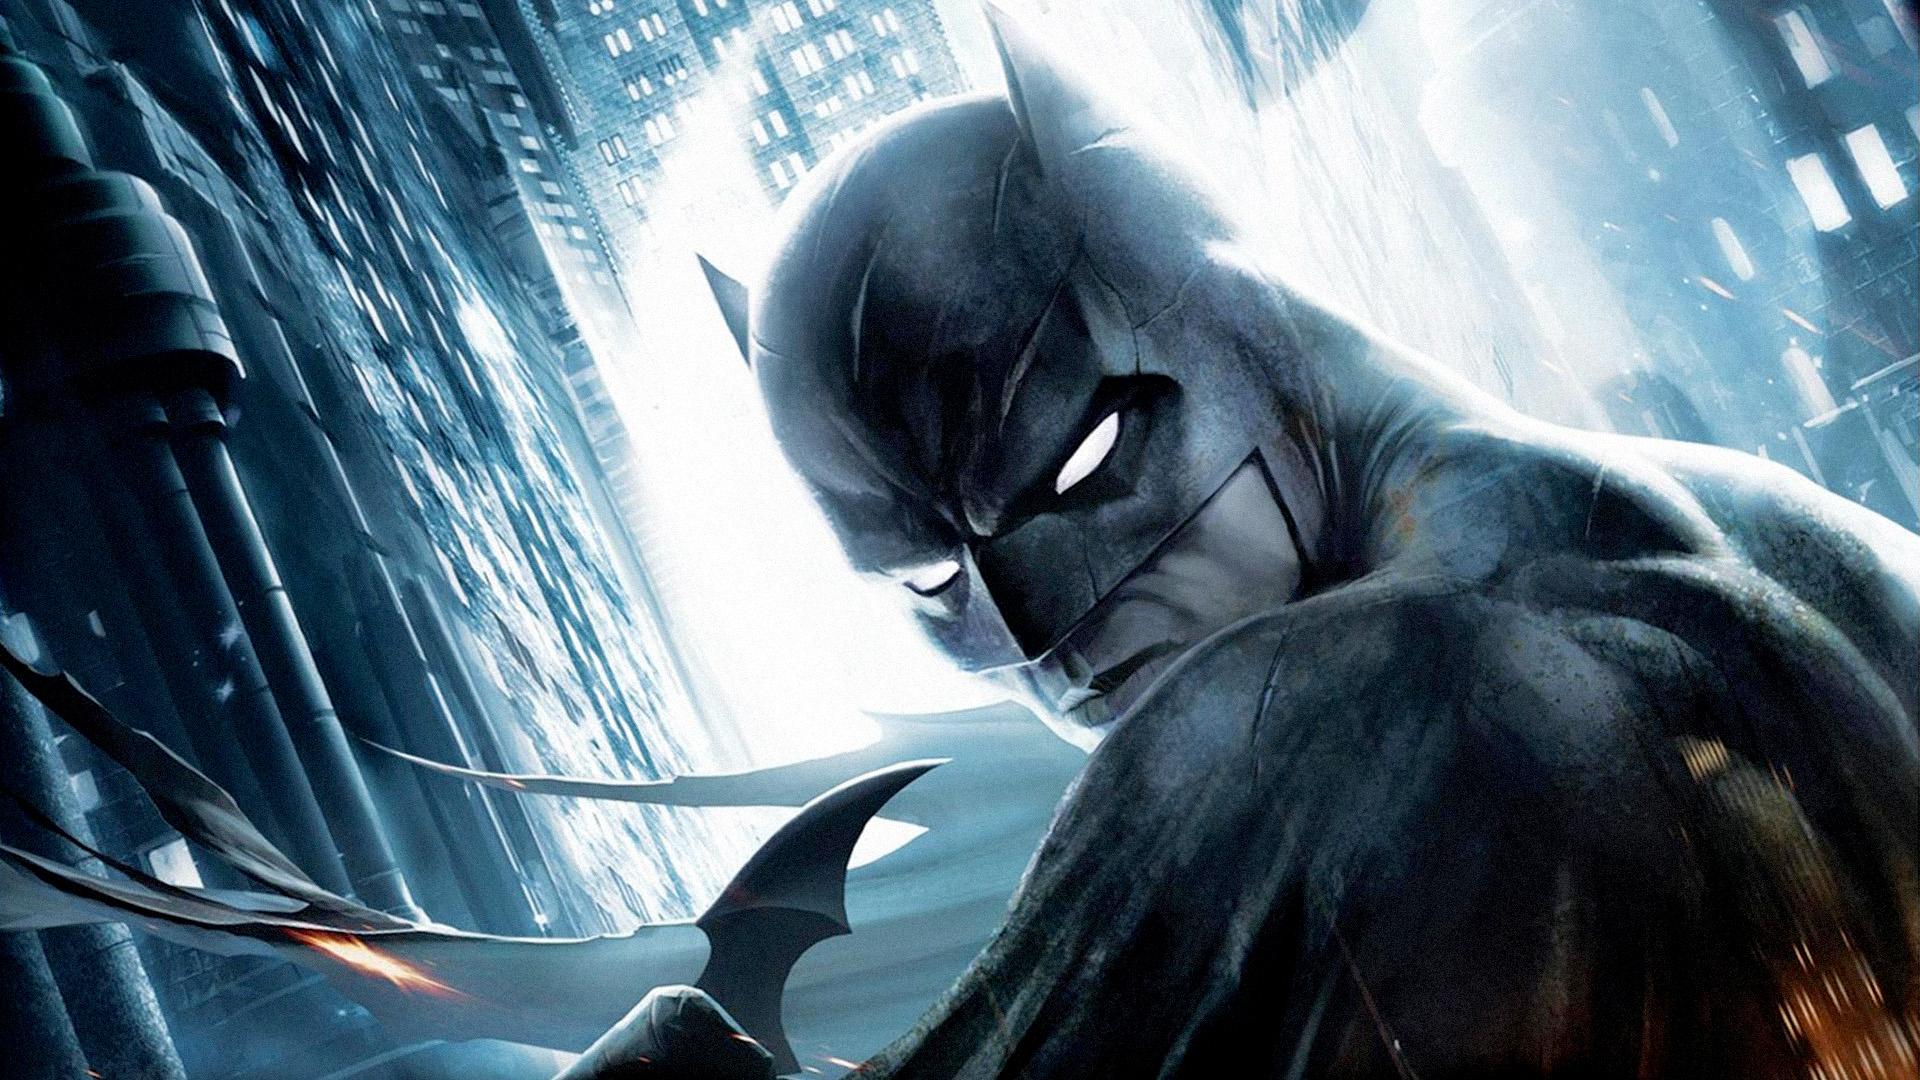 knight batman dark returns animated desktop fanart wallpapers background movies ost cd tv